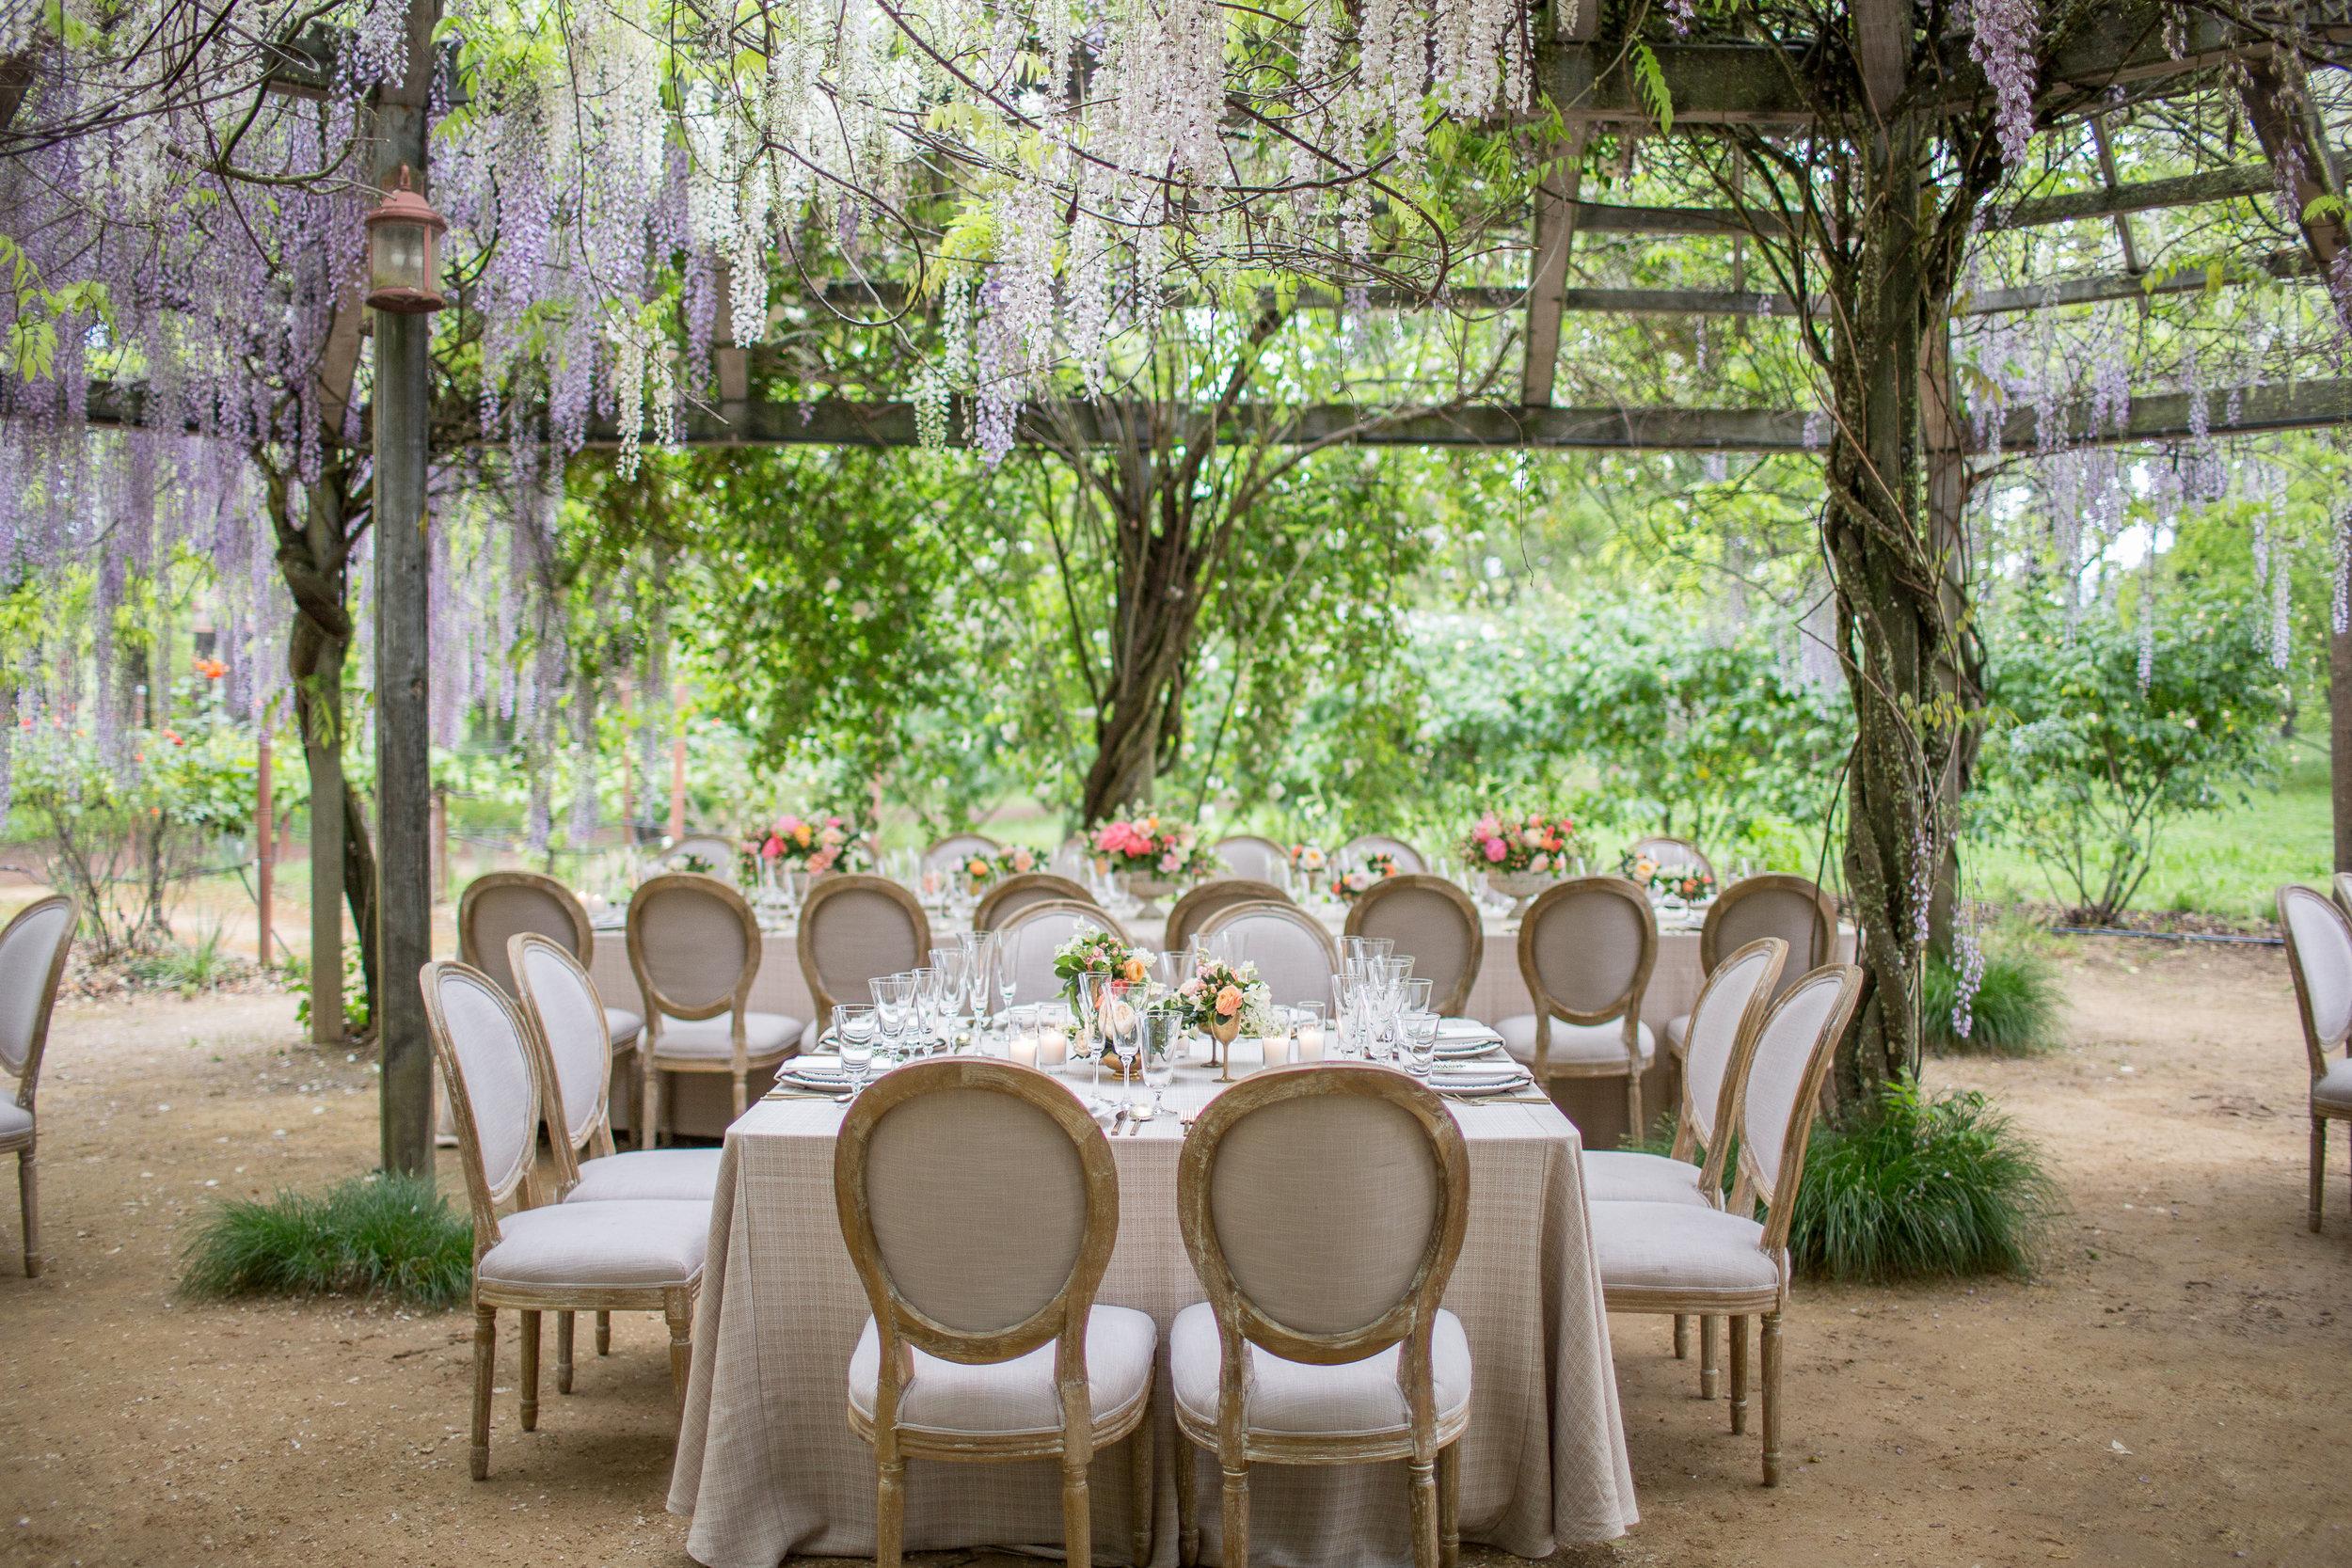 Larissa Cleveland Photography, Floral Design: Revel Floral, Table Design: Morgan Events, Linens: Napa Valley Linens